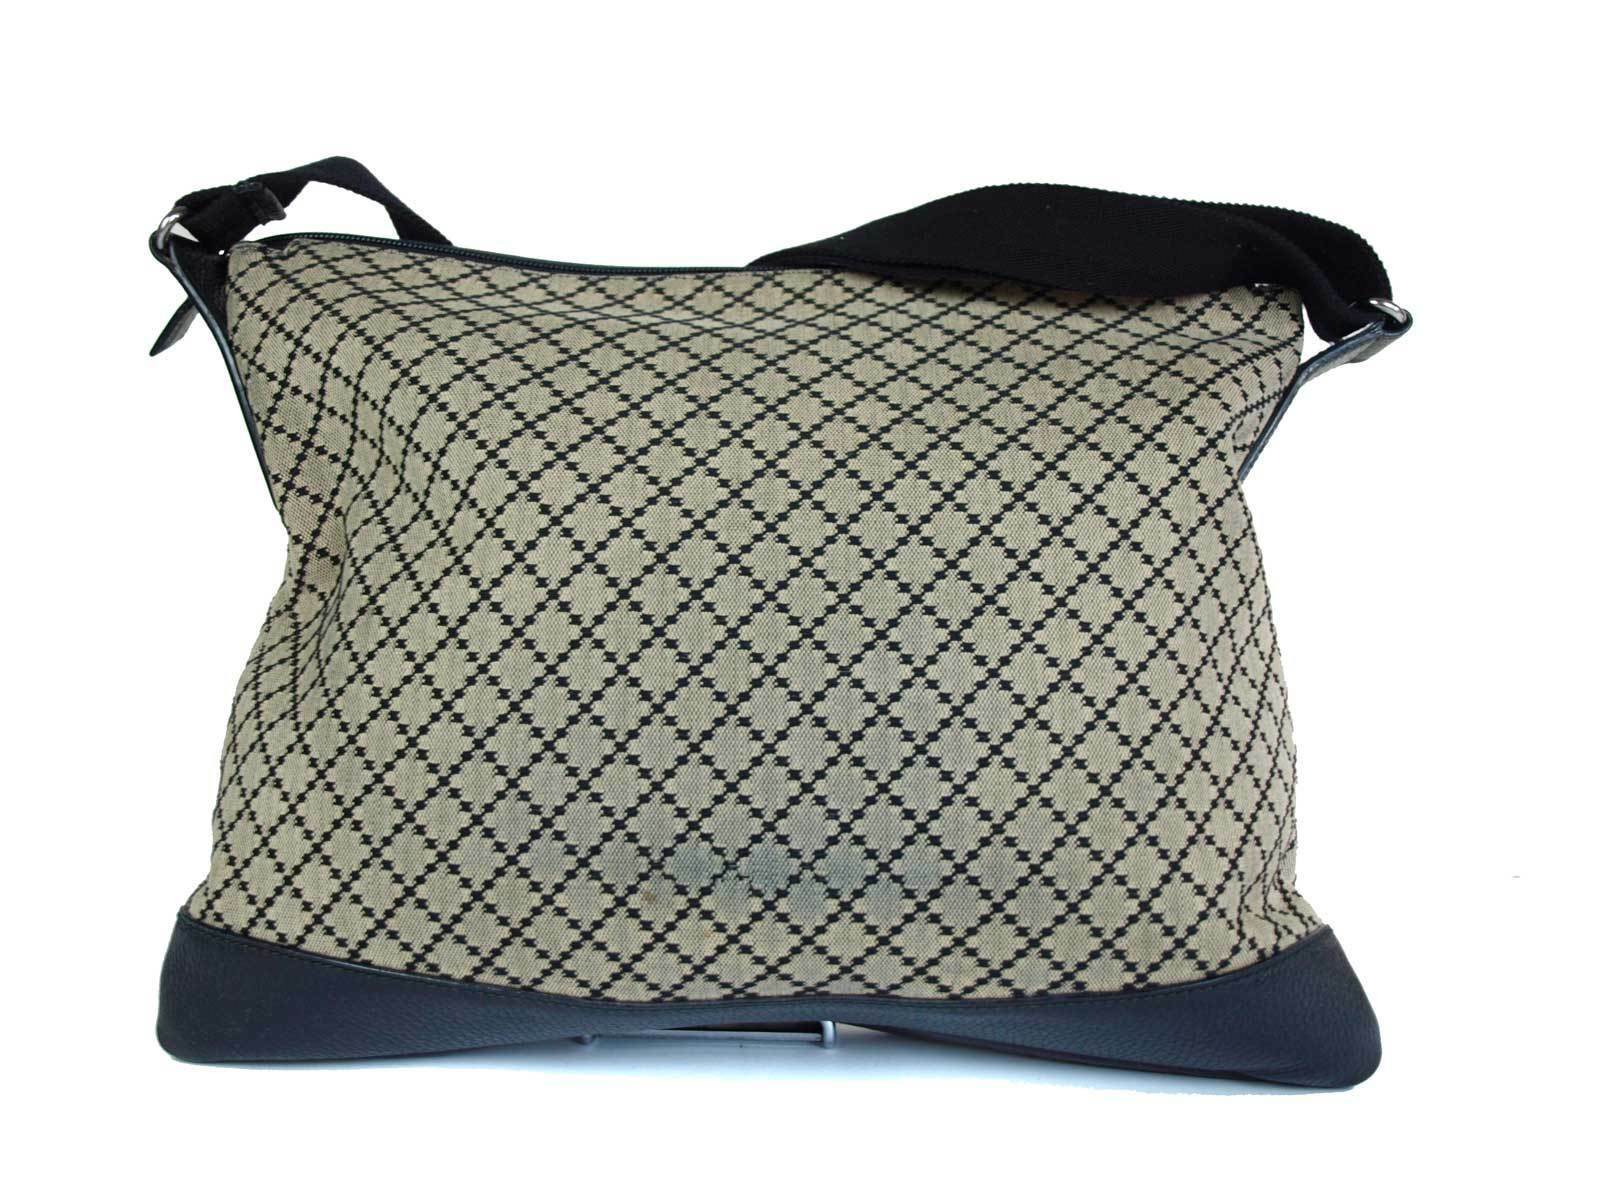 Auth GUCCI Diamante Canvas Leather Black Cross-Body Shoulder Bag GS1762